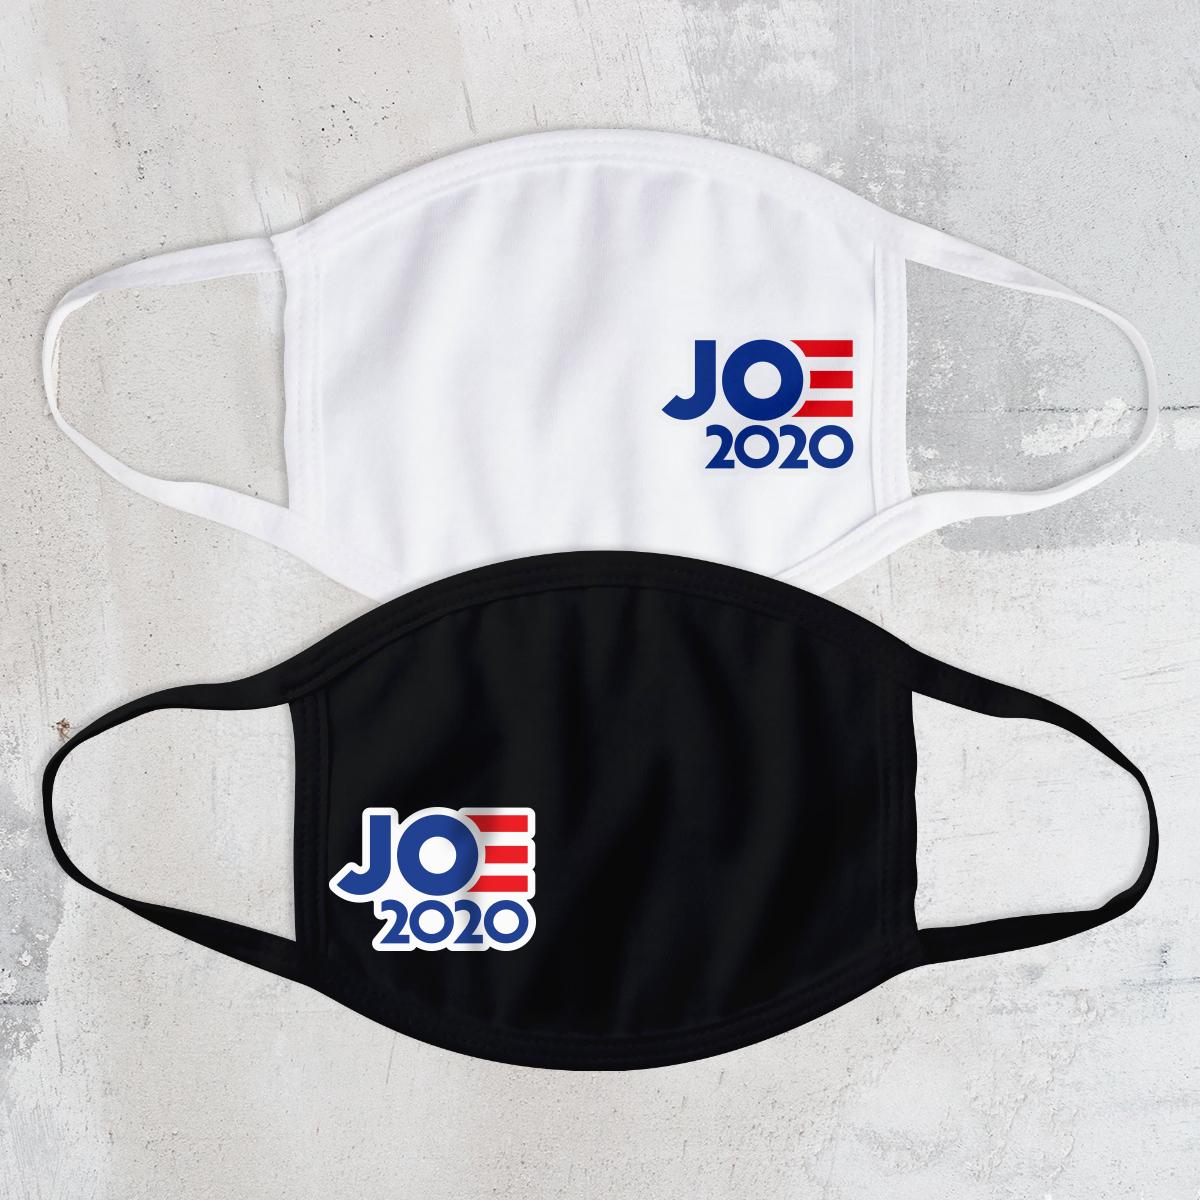 Joe 2020 Face Mask